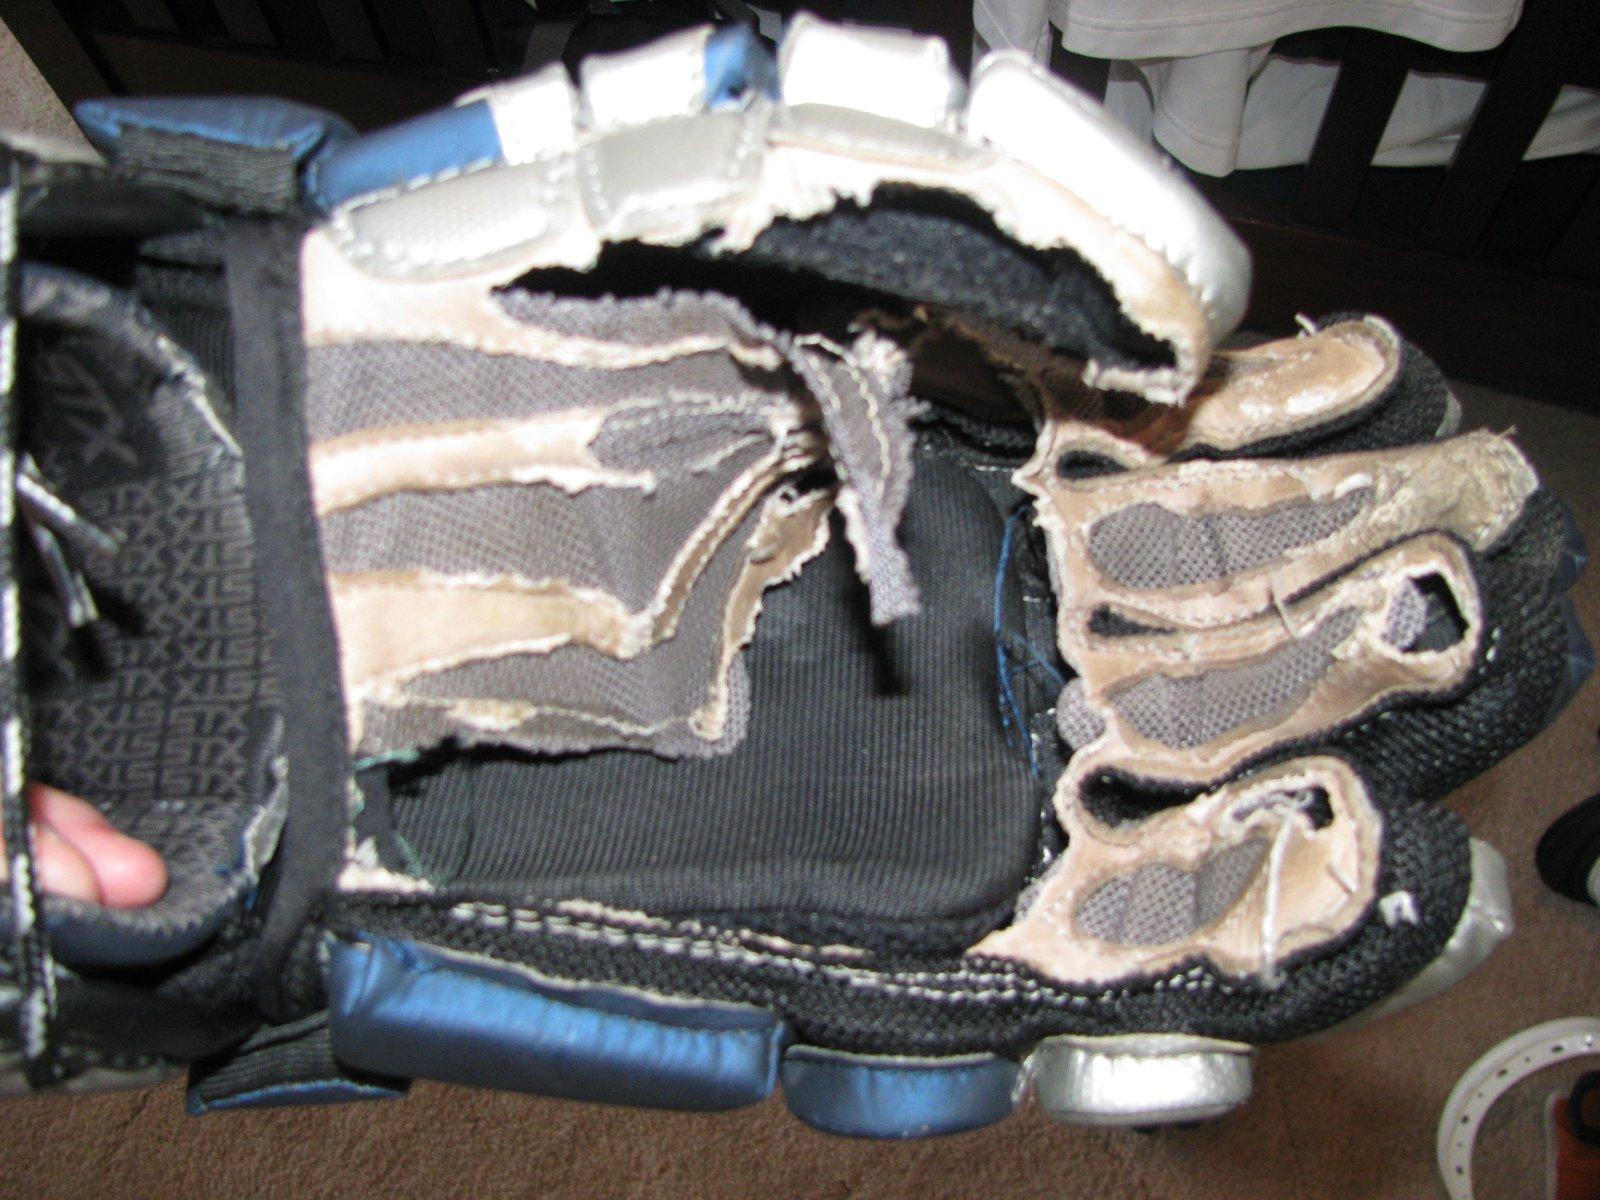 Damn mouse at 200$ gloves